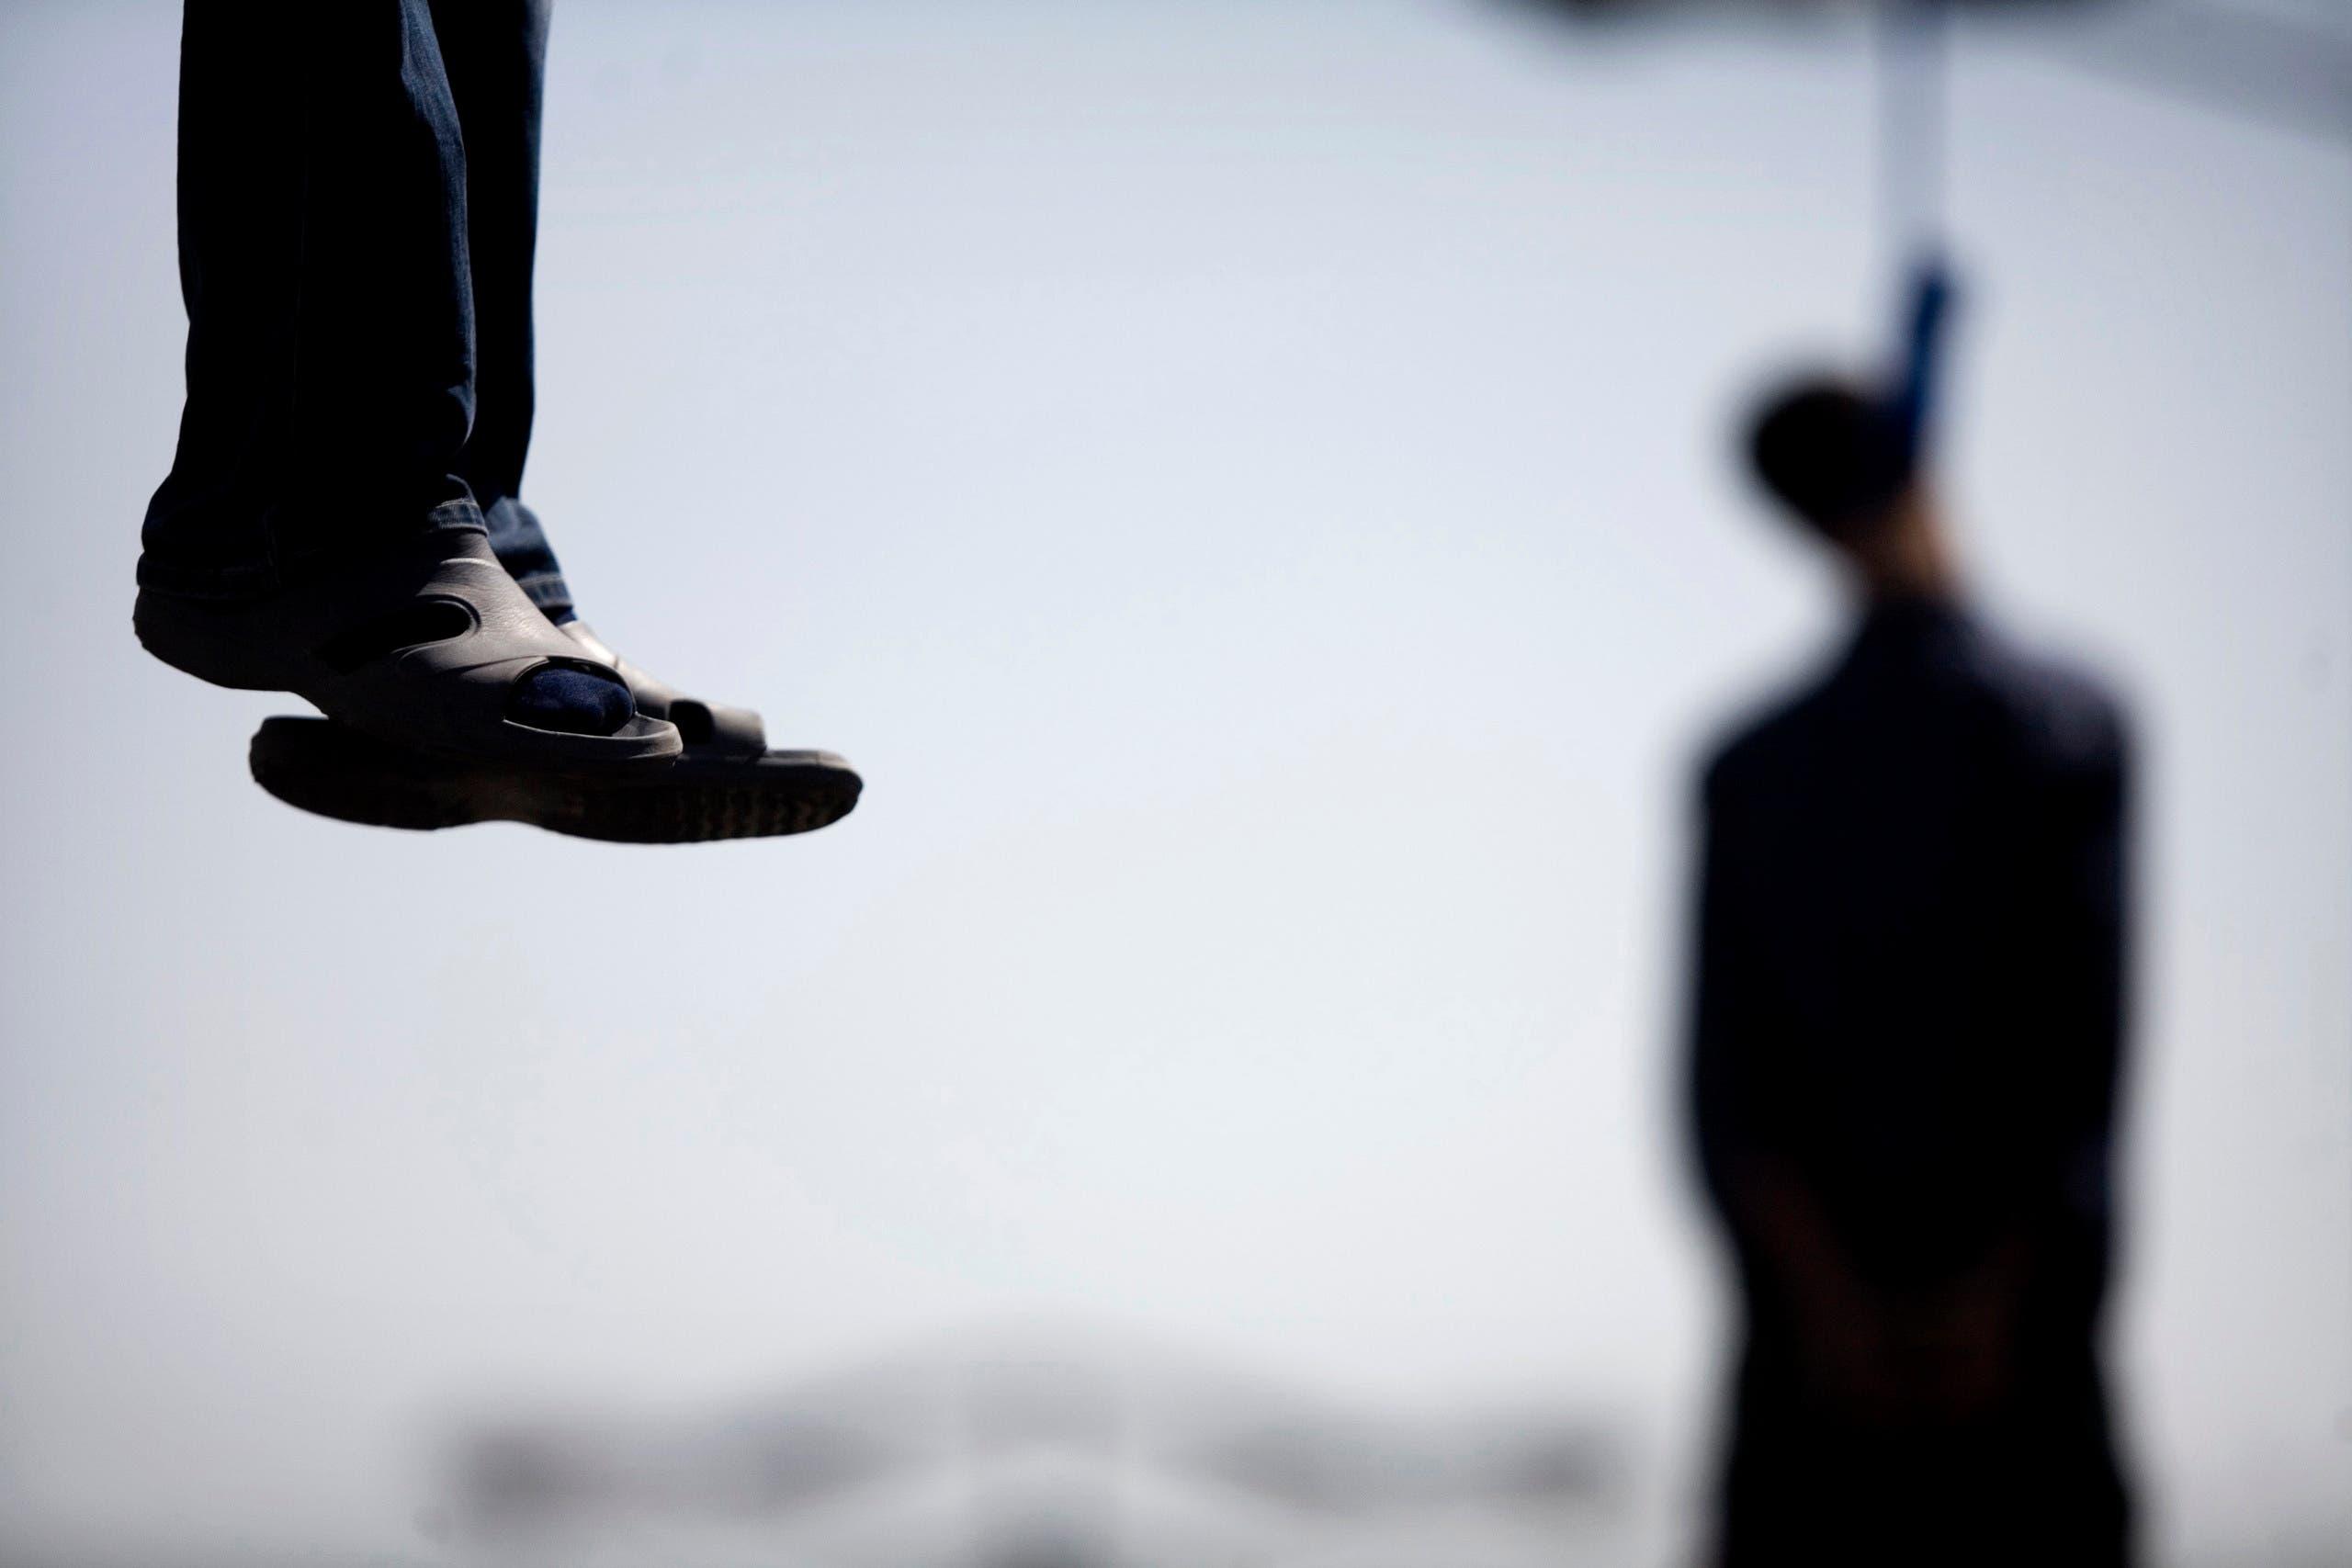 iran hanging reuters